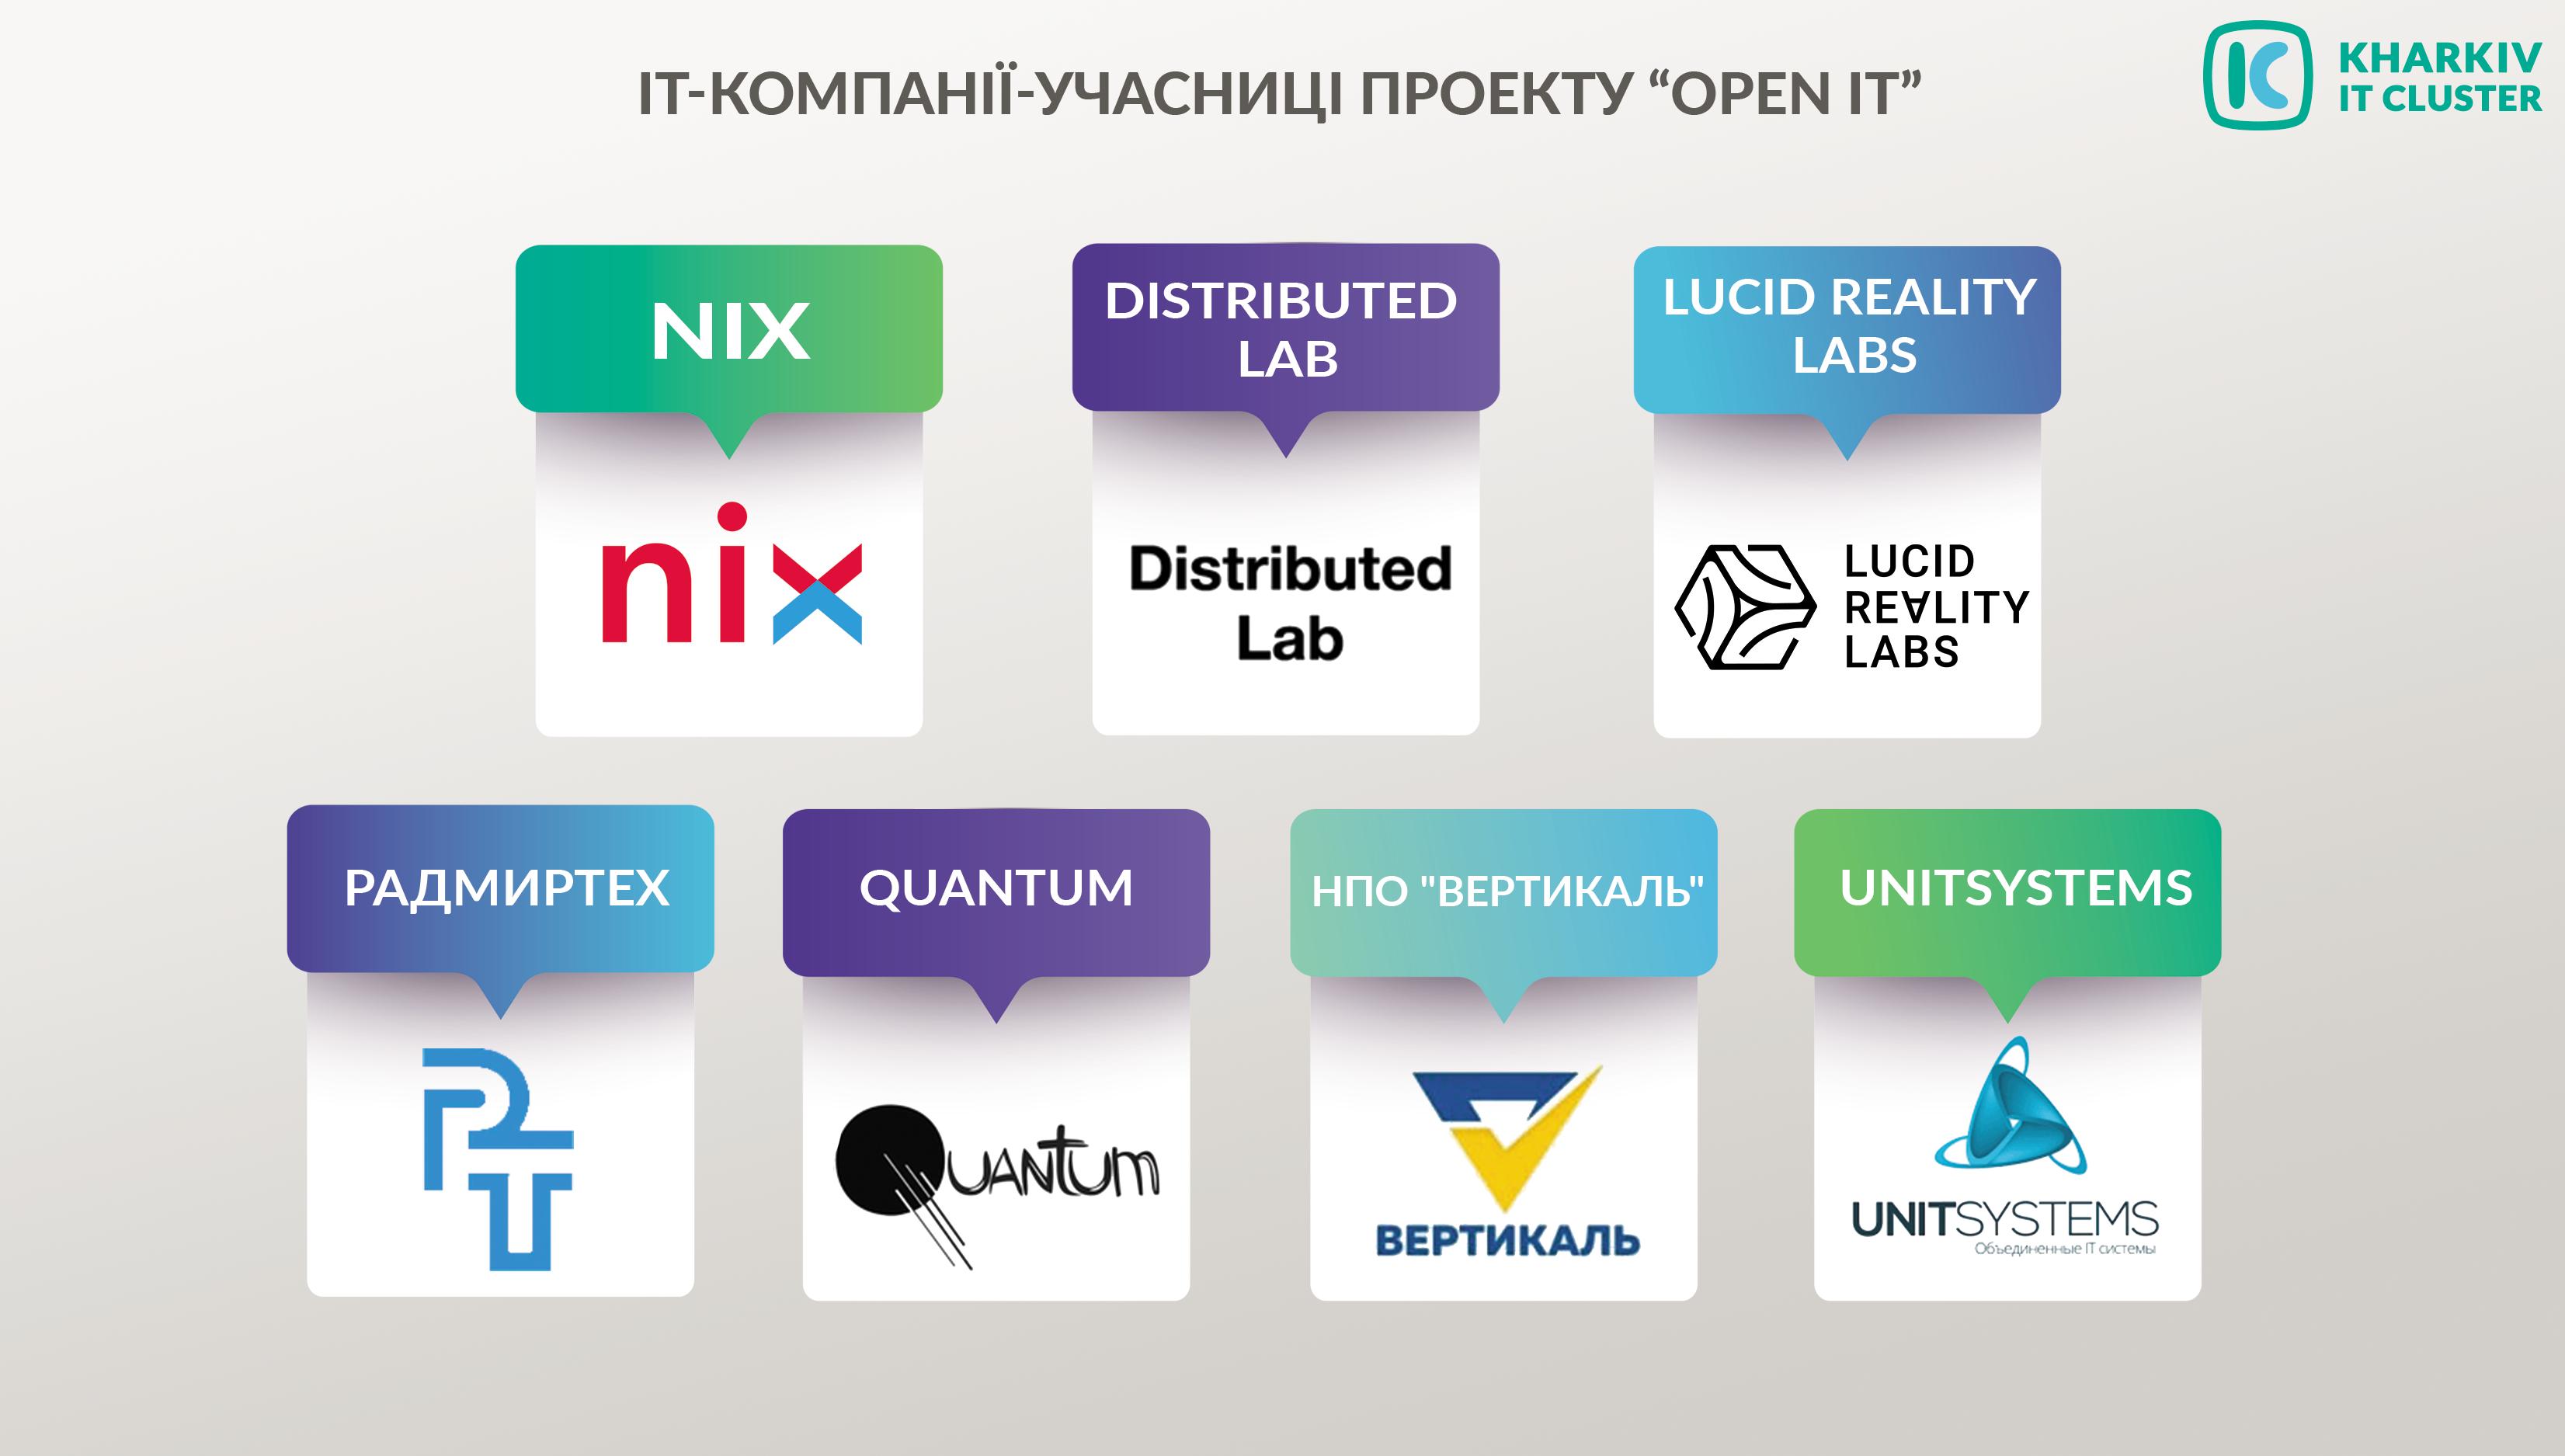 infographics3 Доступно о трендах high-tech индустрии: итоги и перспективы проекта Open IT